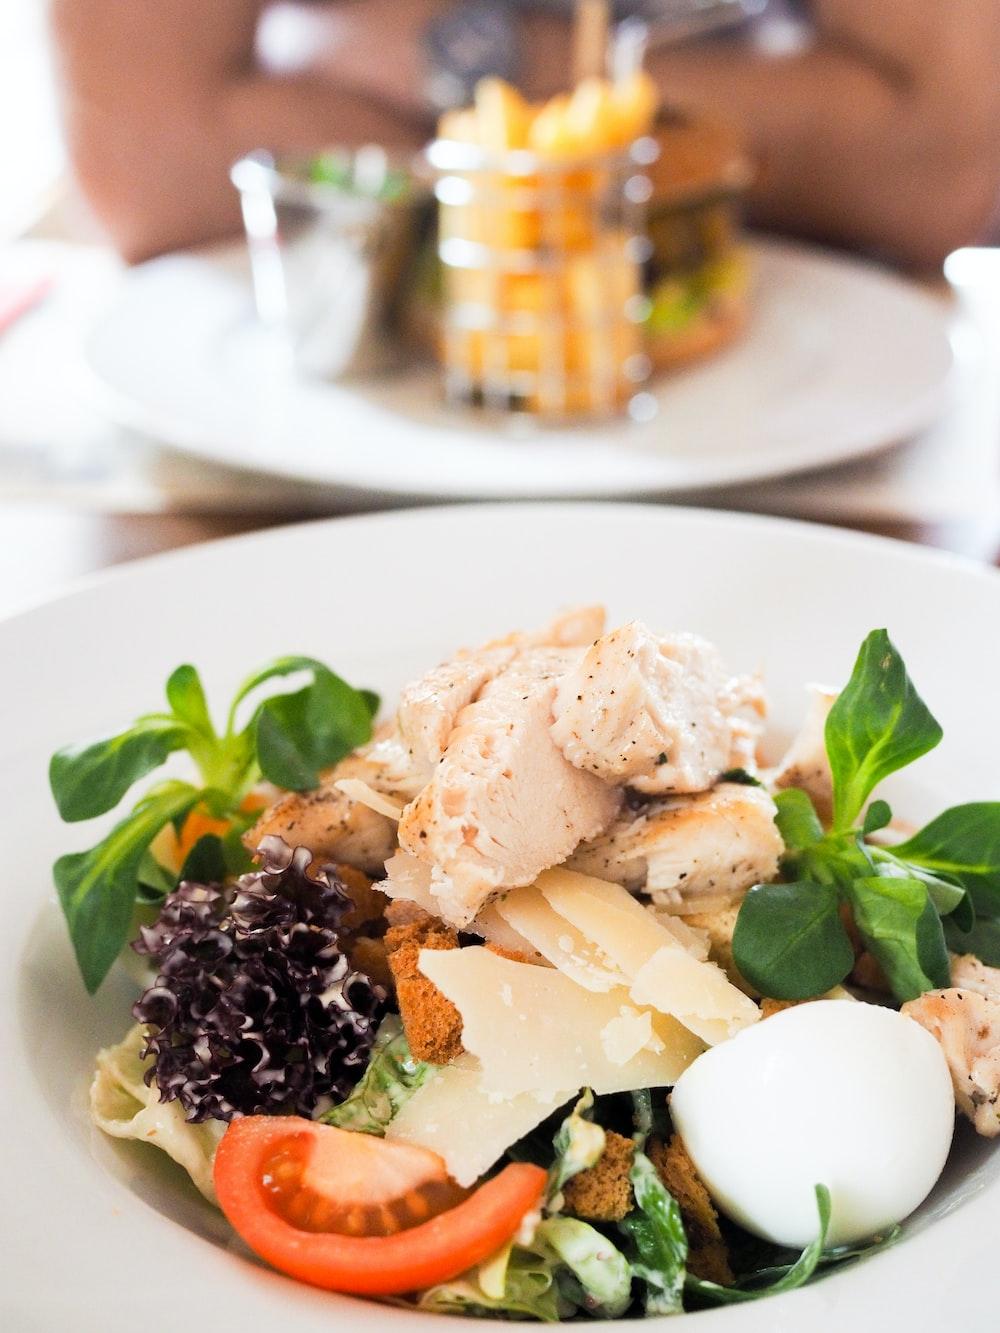 chicken salad served on white ceramic plate